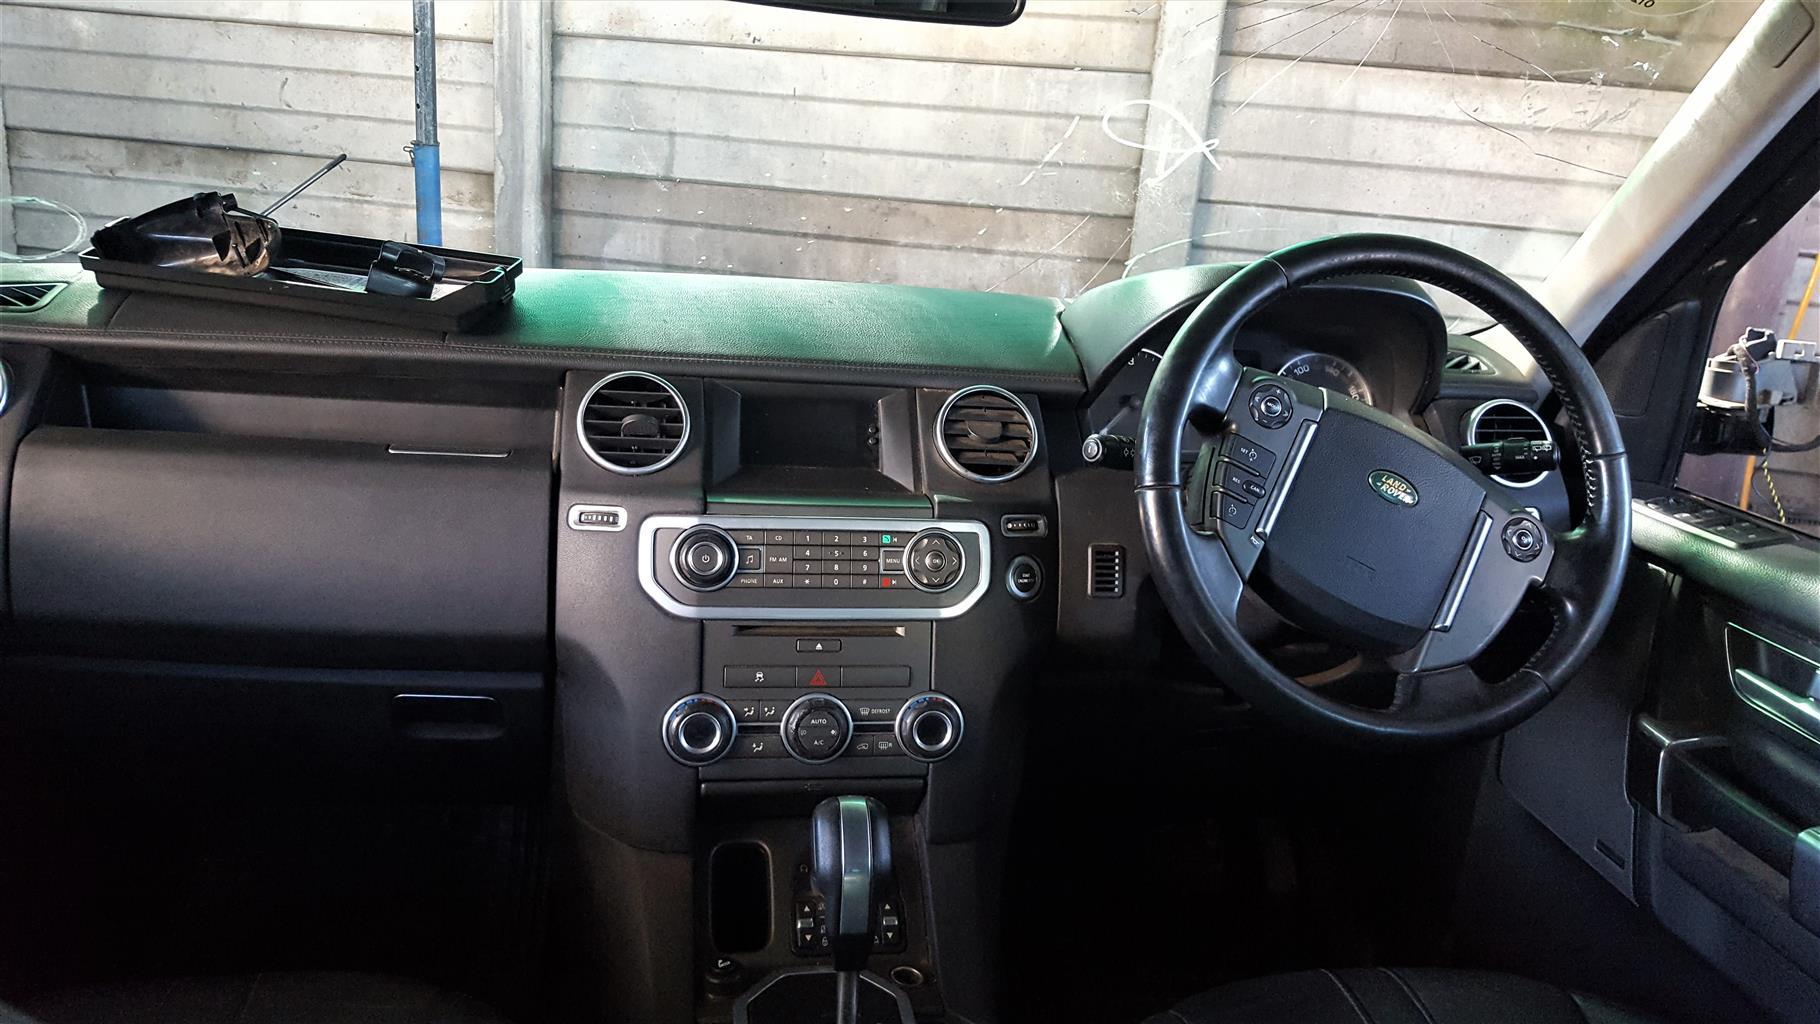 Land Rover Discovery 4 Radio for sale | AUTO EZI